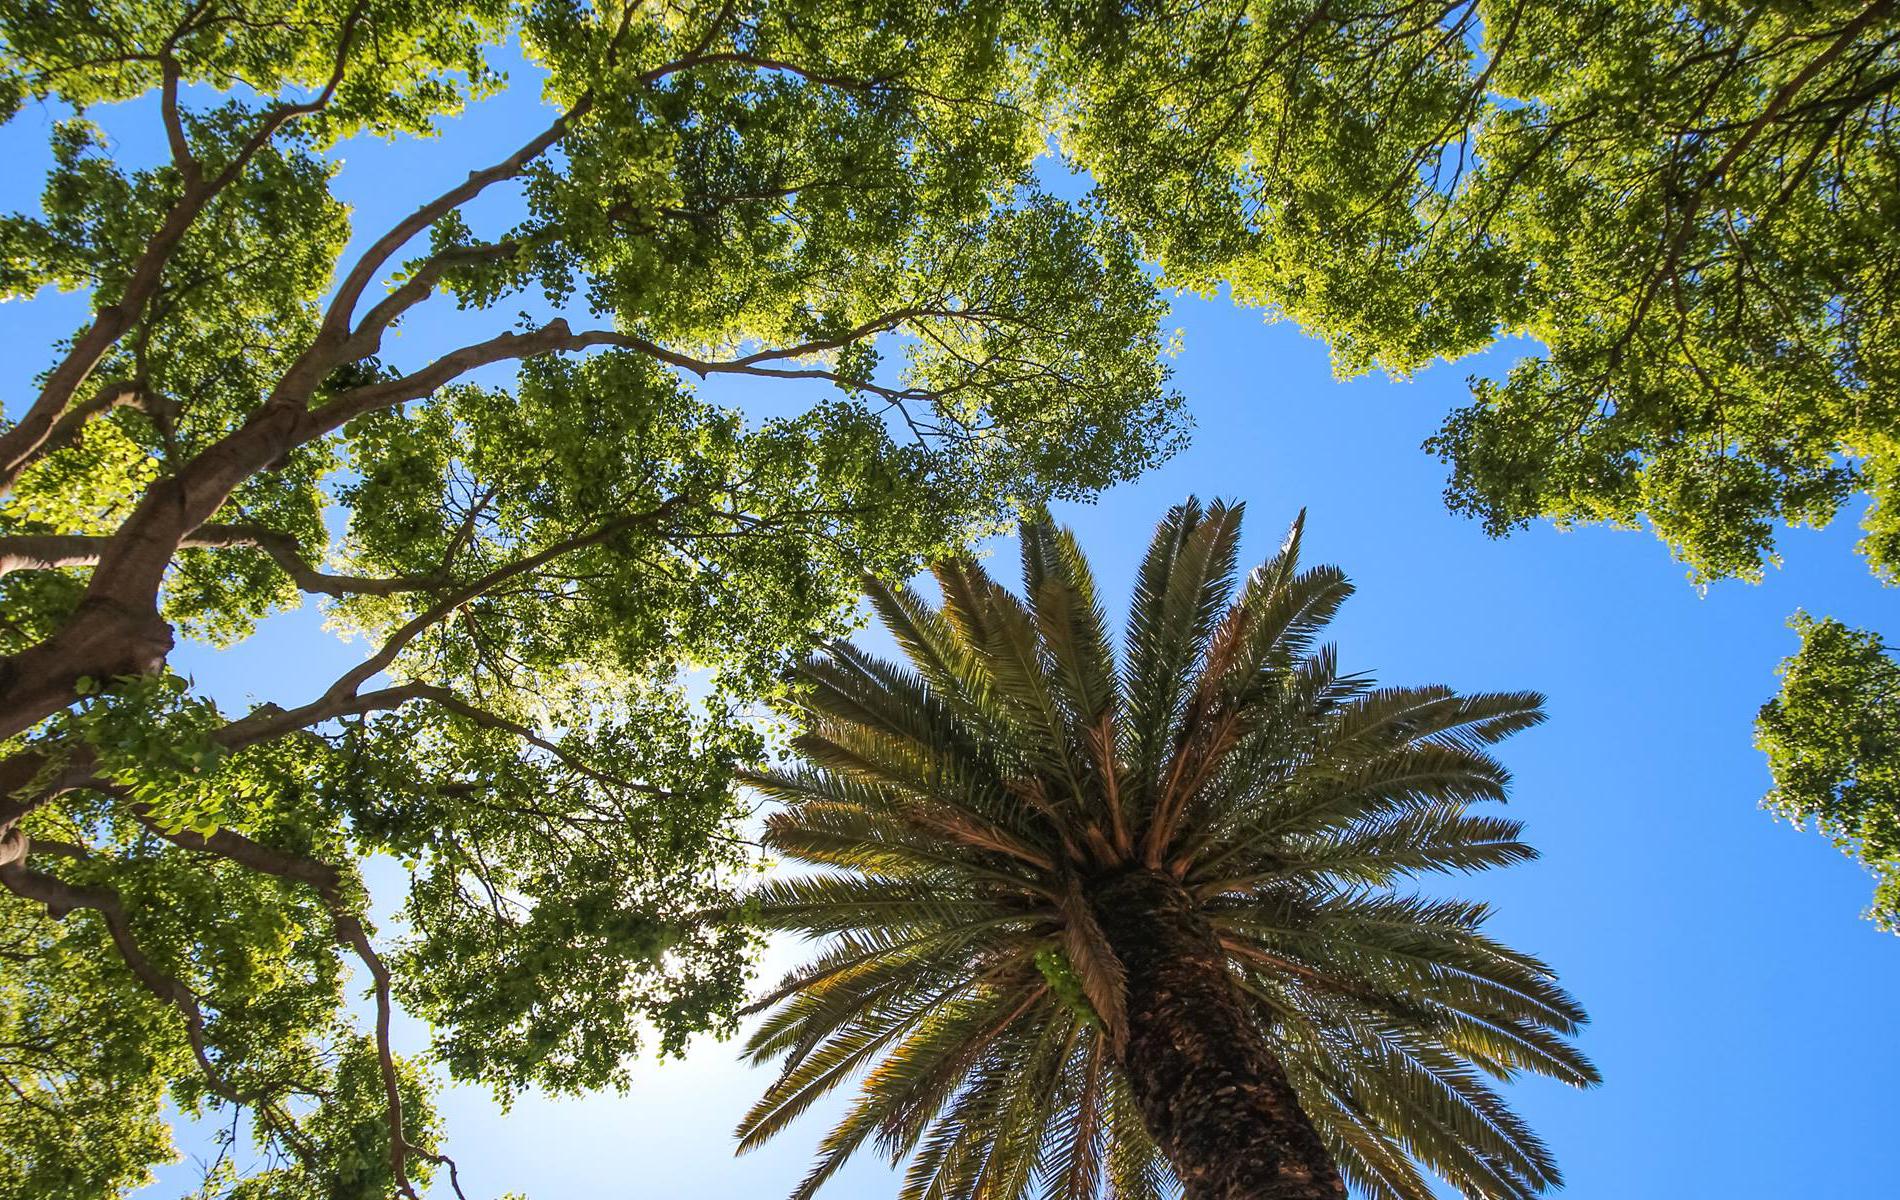 Green space in Destin Palm Trees courtesy of Trees Destin